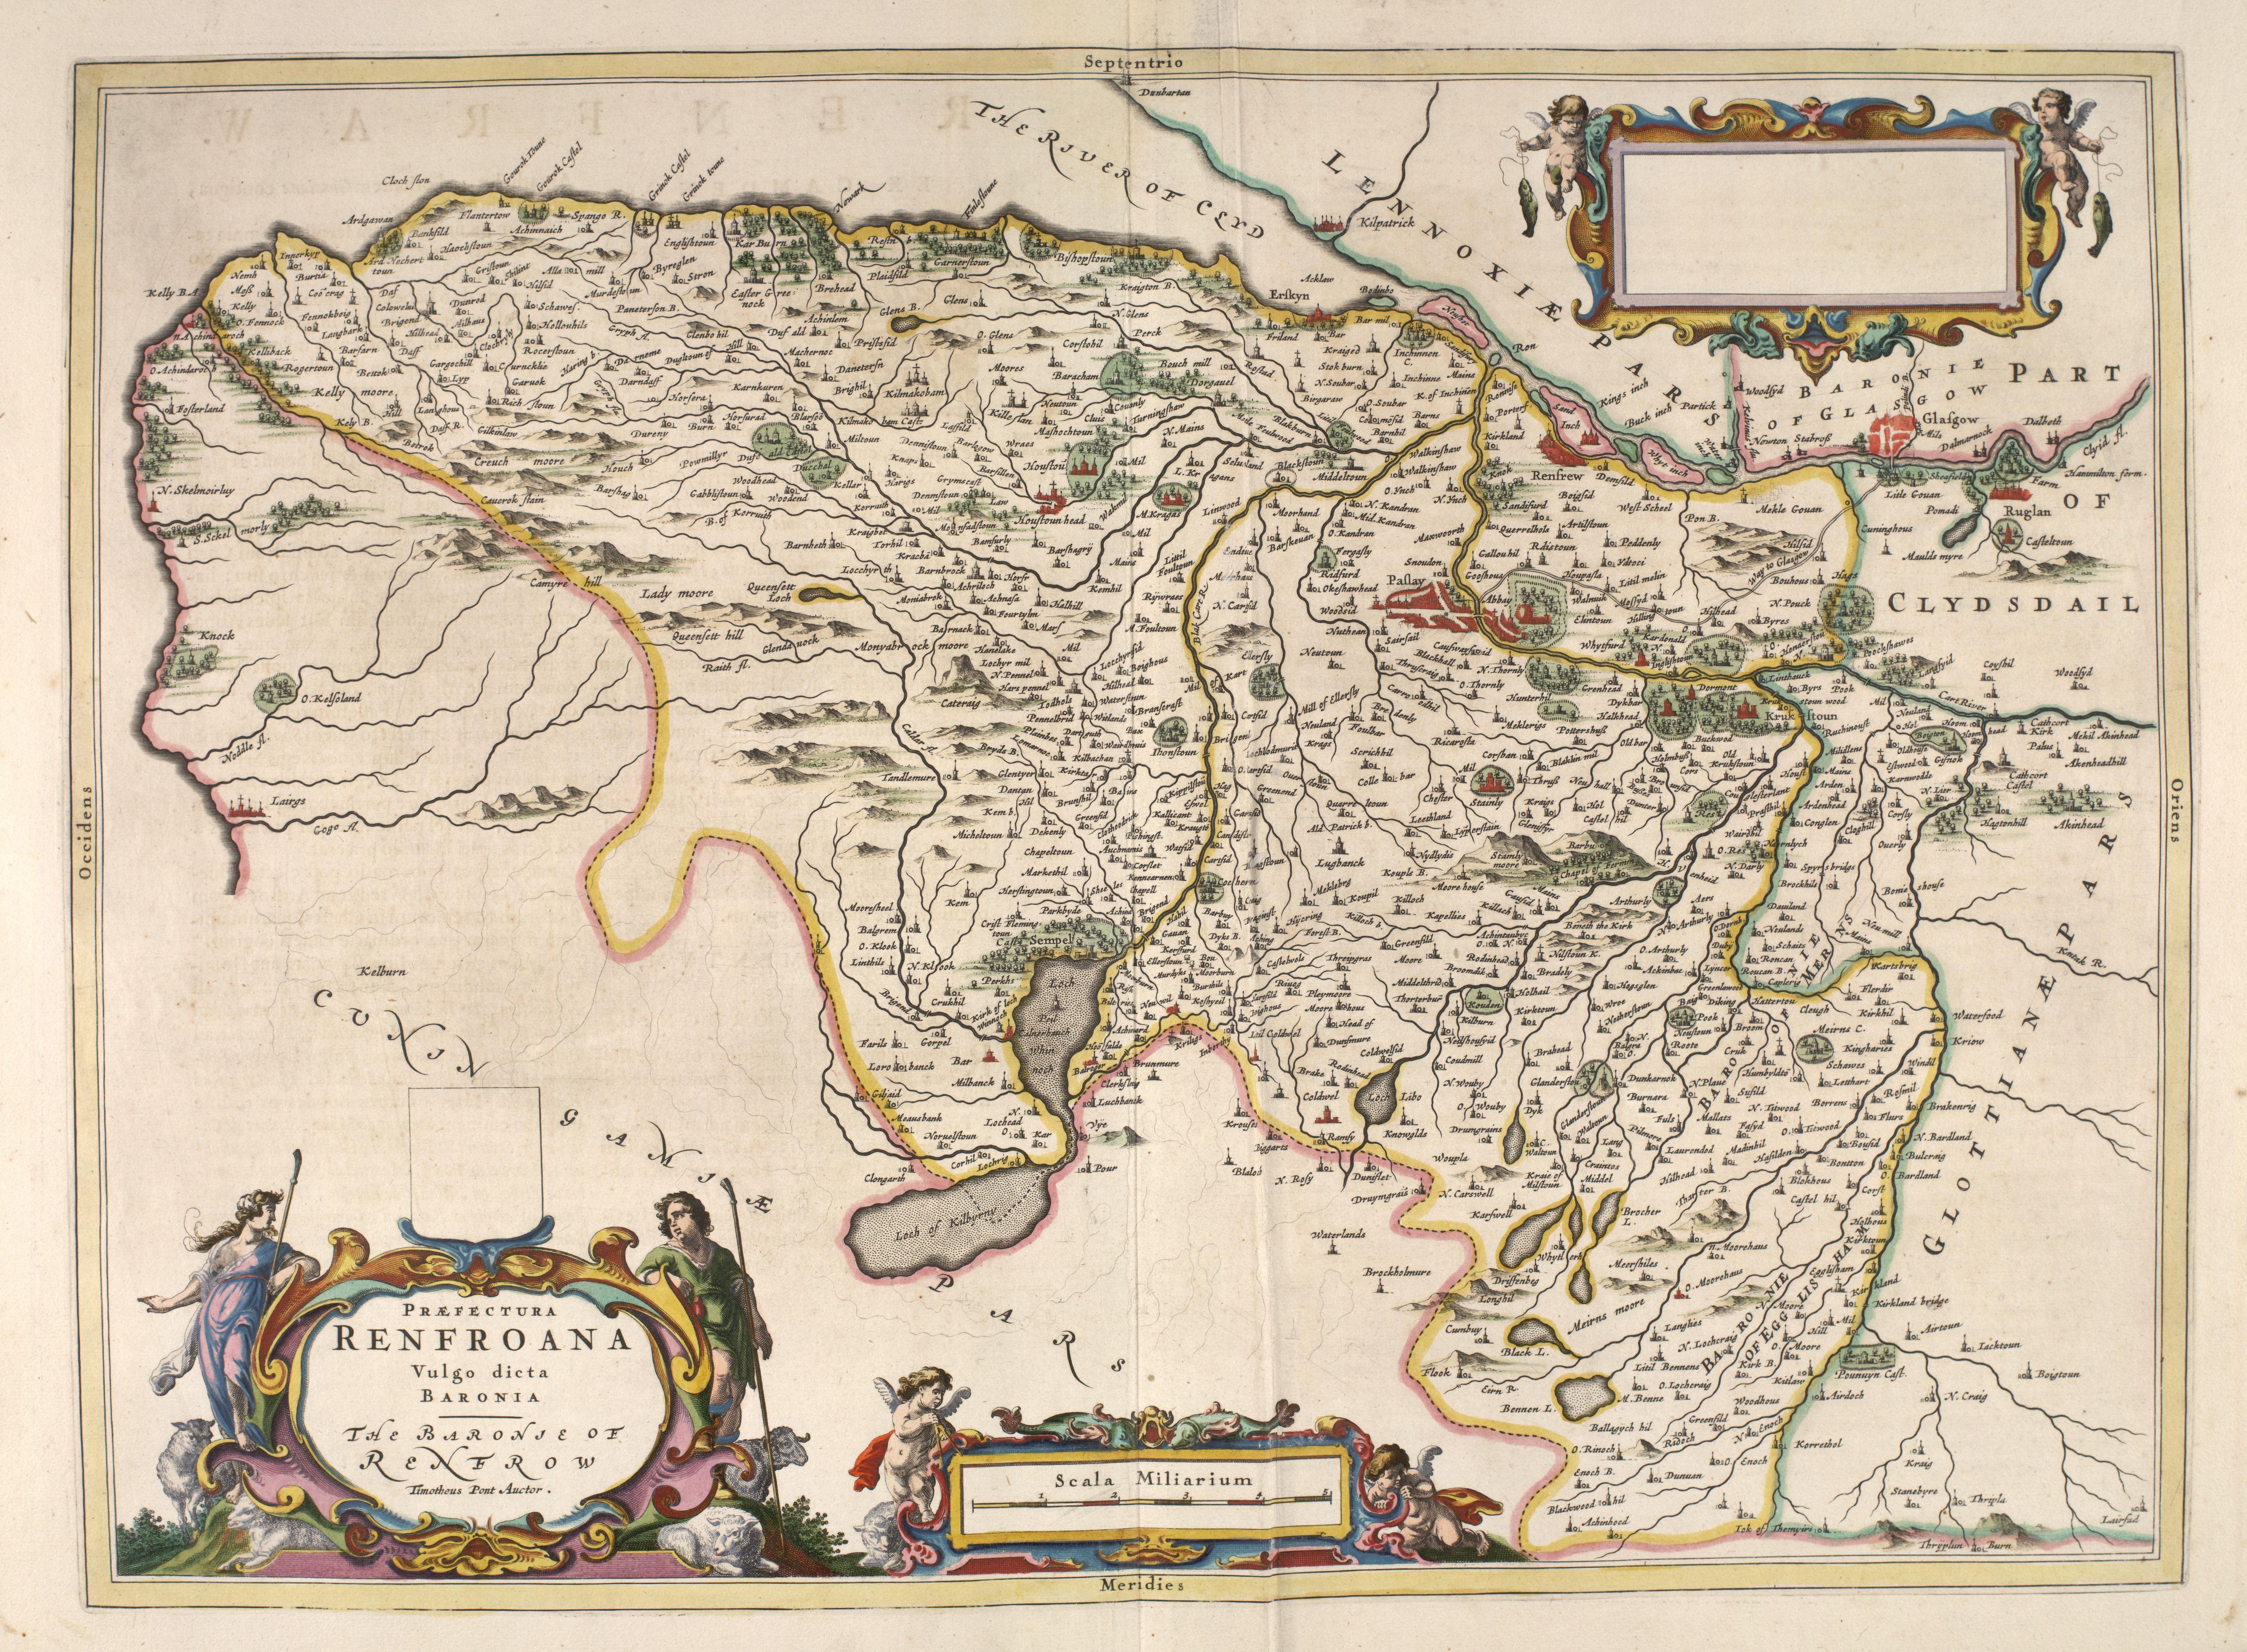 File:Blaeu - Atlas of Scotland 1654 - RENFROANA - Renfrew.jpg